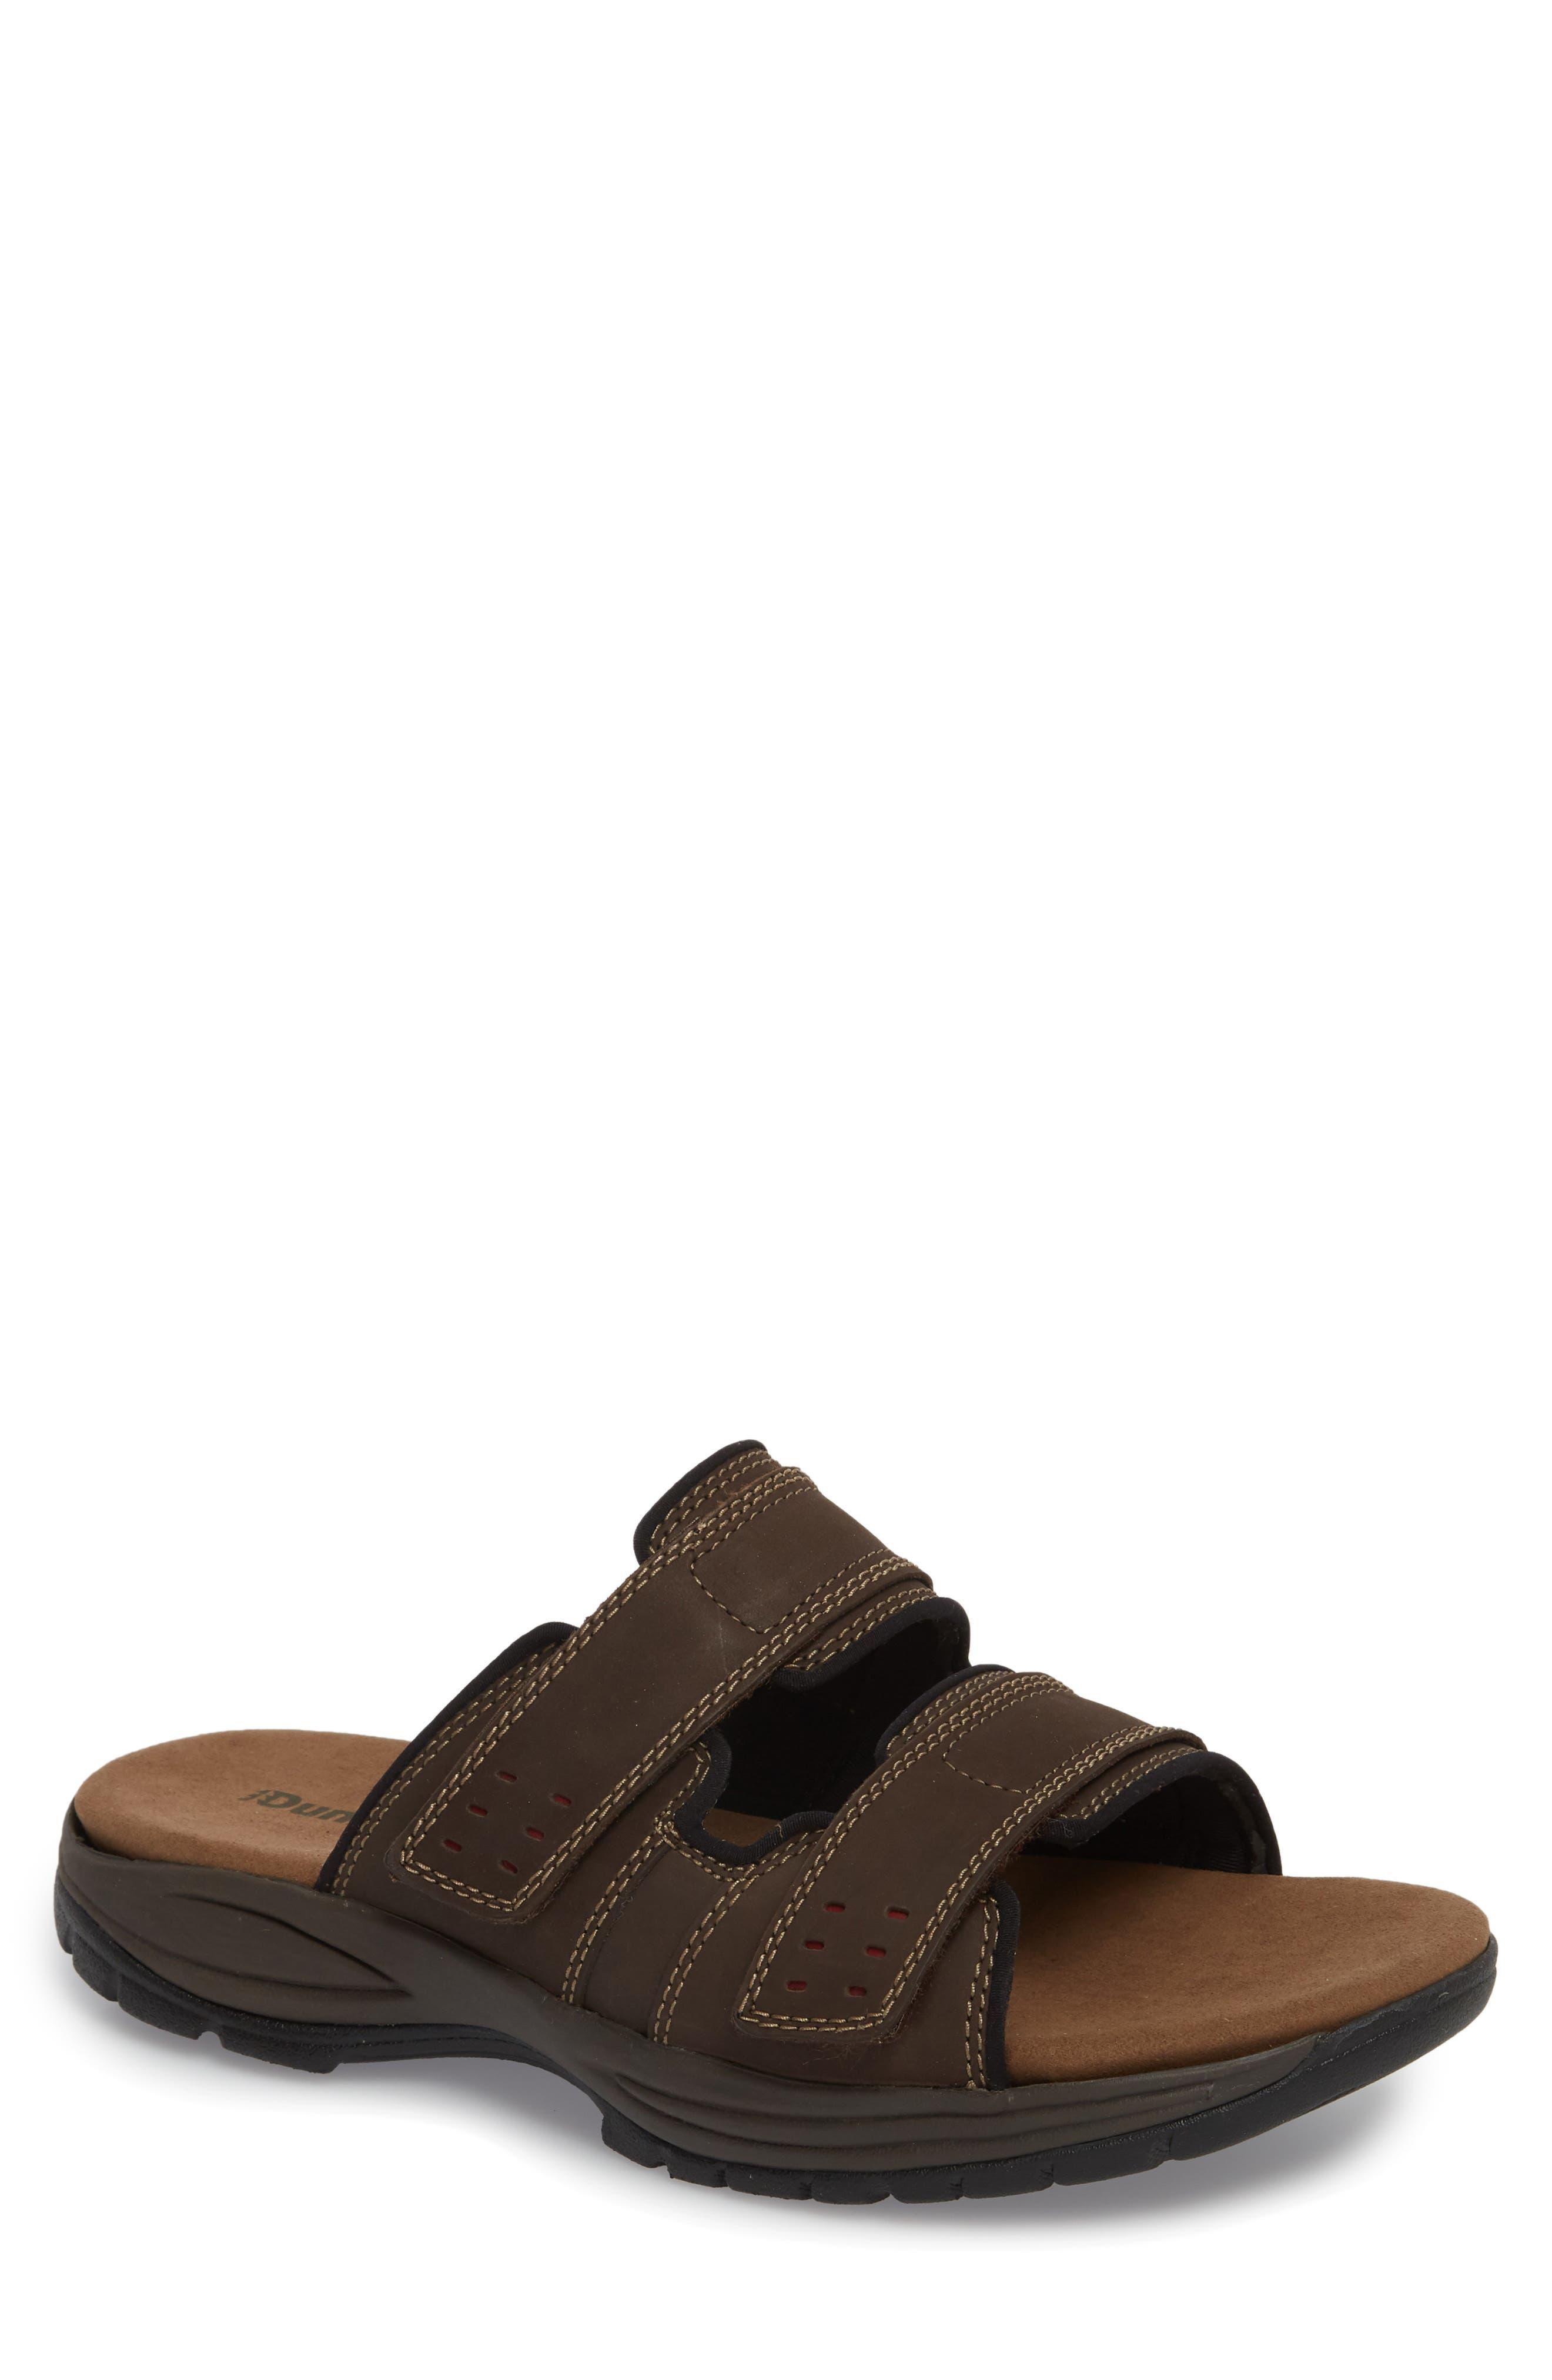 Newport Slide Sandal,                             Main thumbnail 1, color,                             DARK BROWN LEATHER